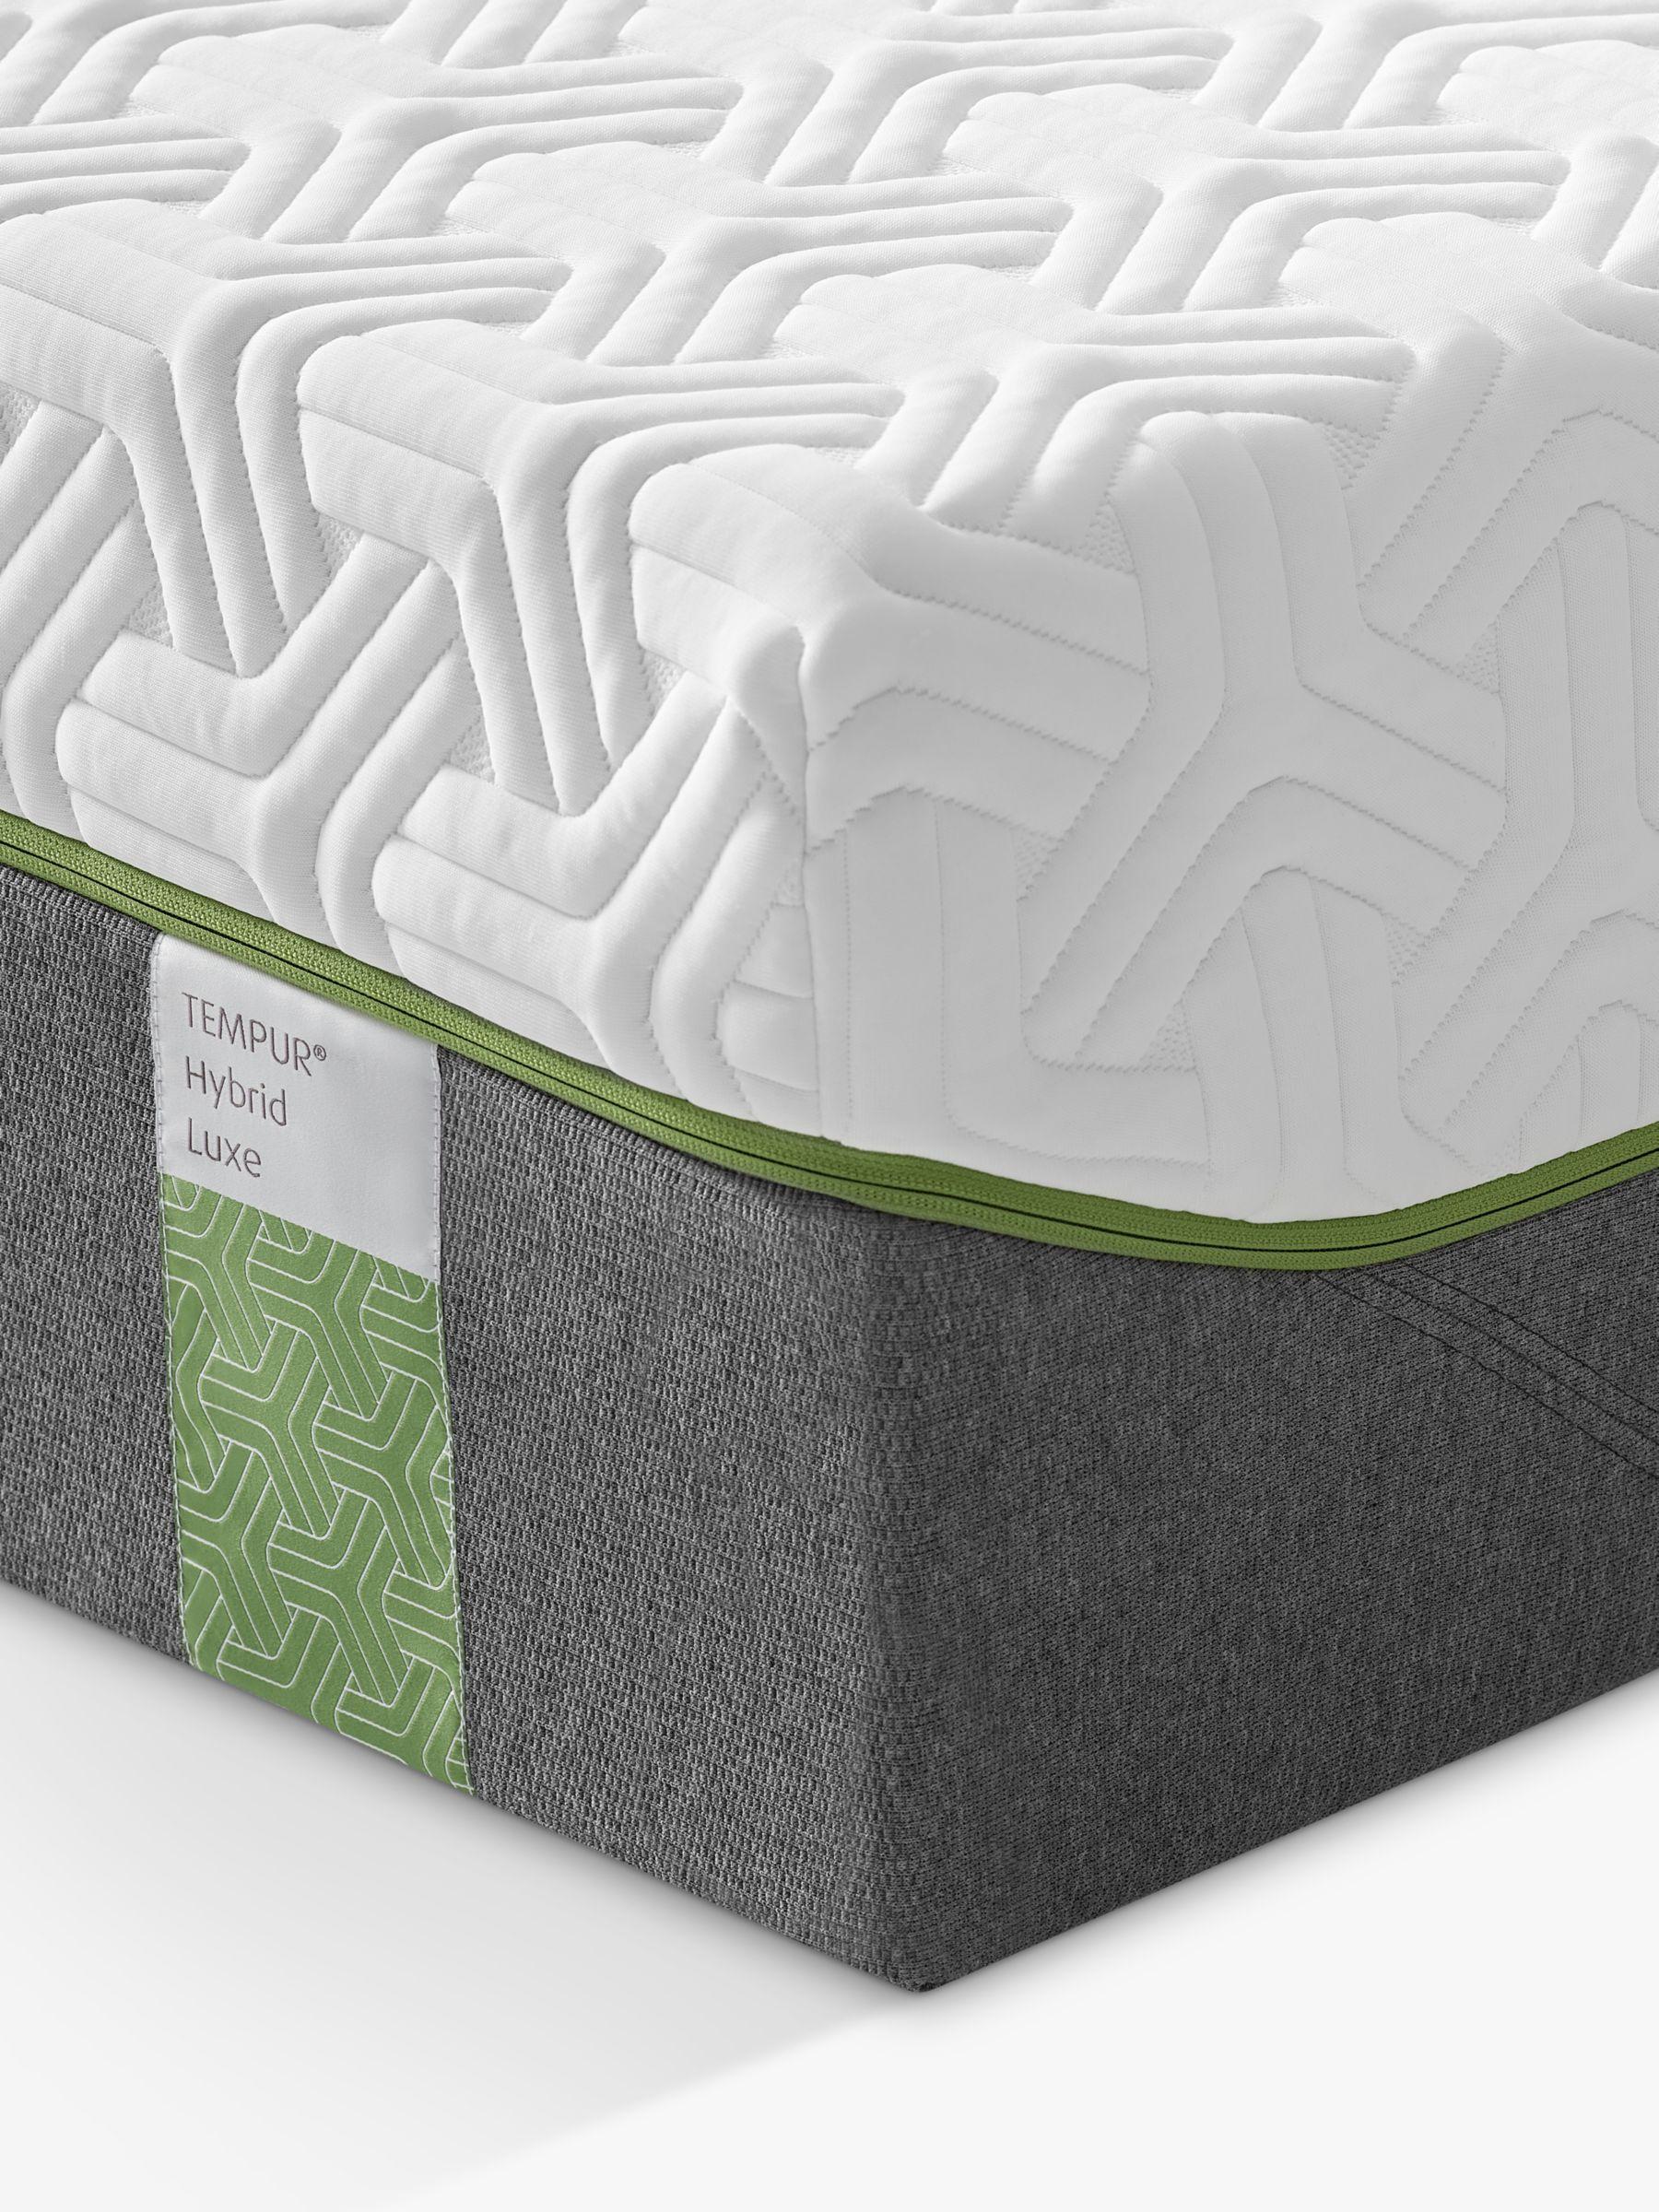 Tempur Tempur Hybrid Luxe 30 Pocket Spring Memory Foam Mattress, Medium Tension, Continental King Size